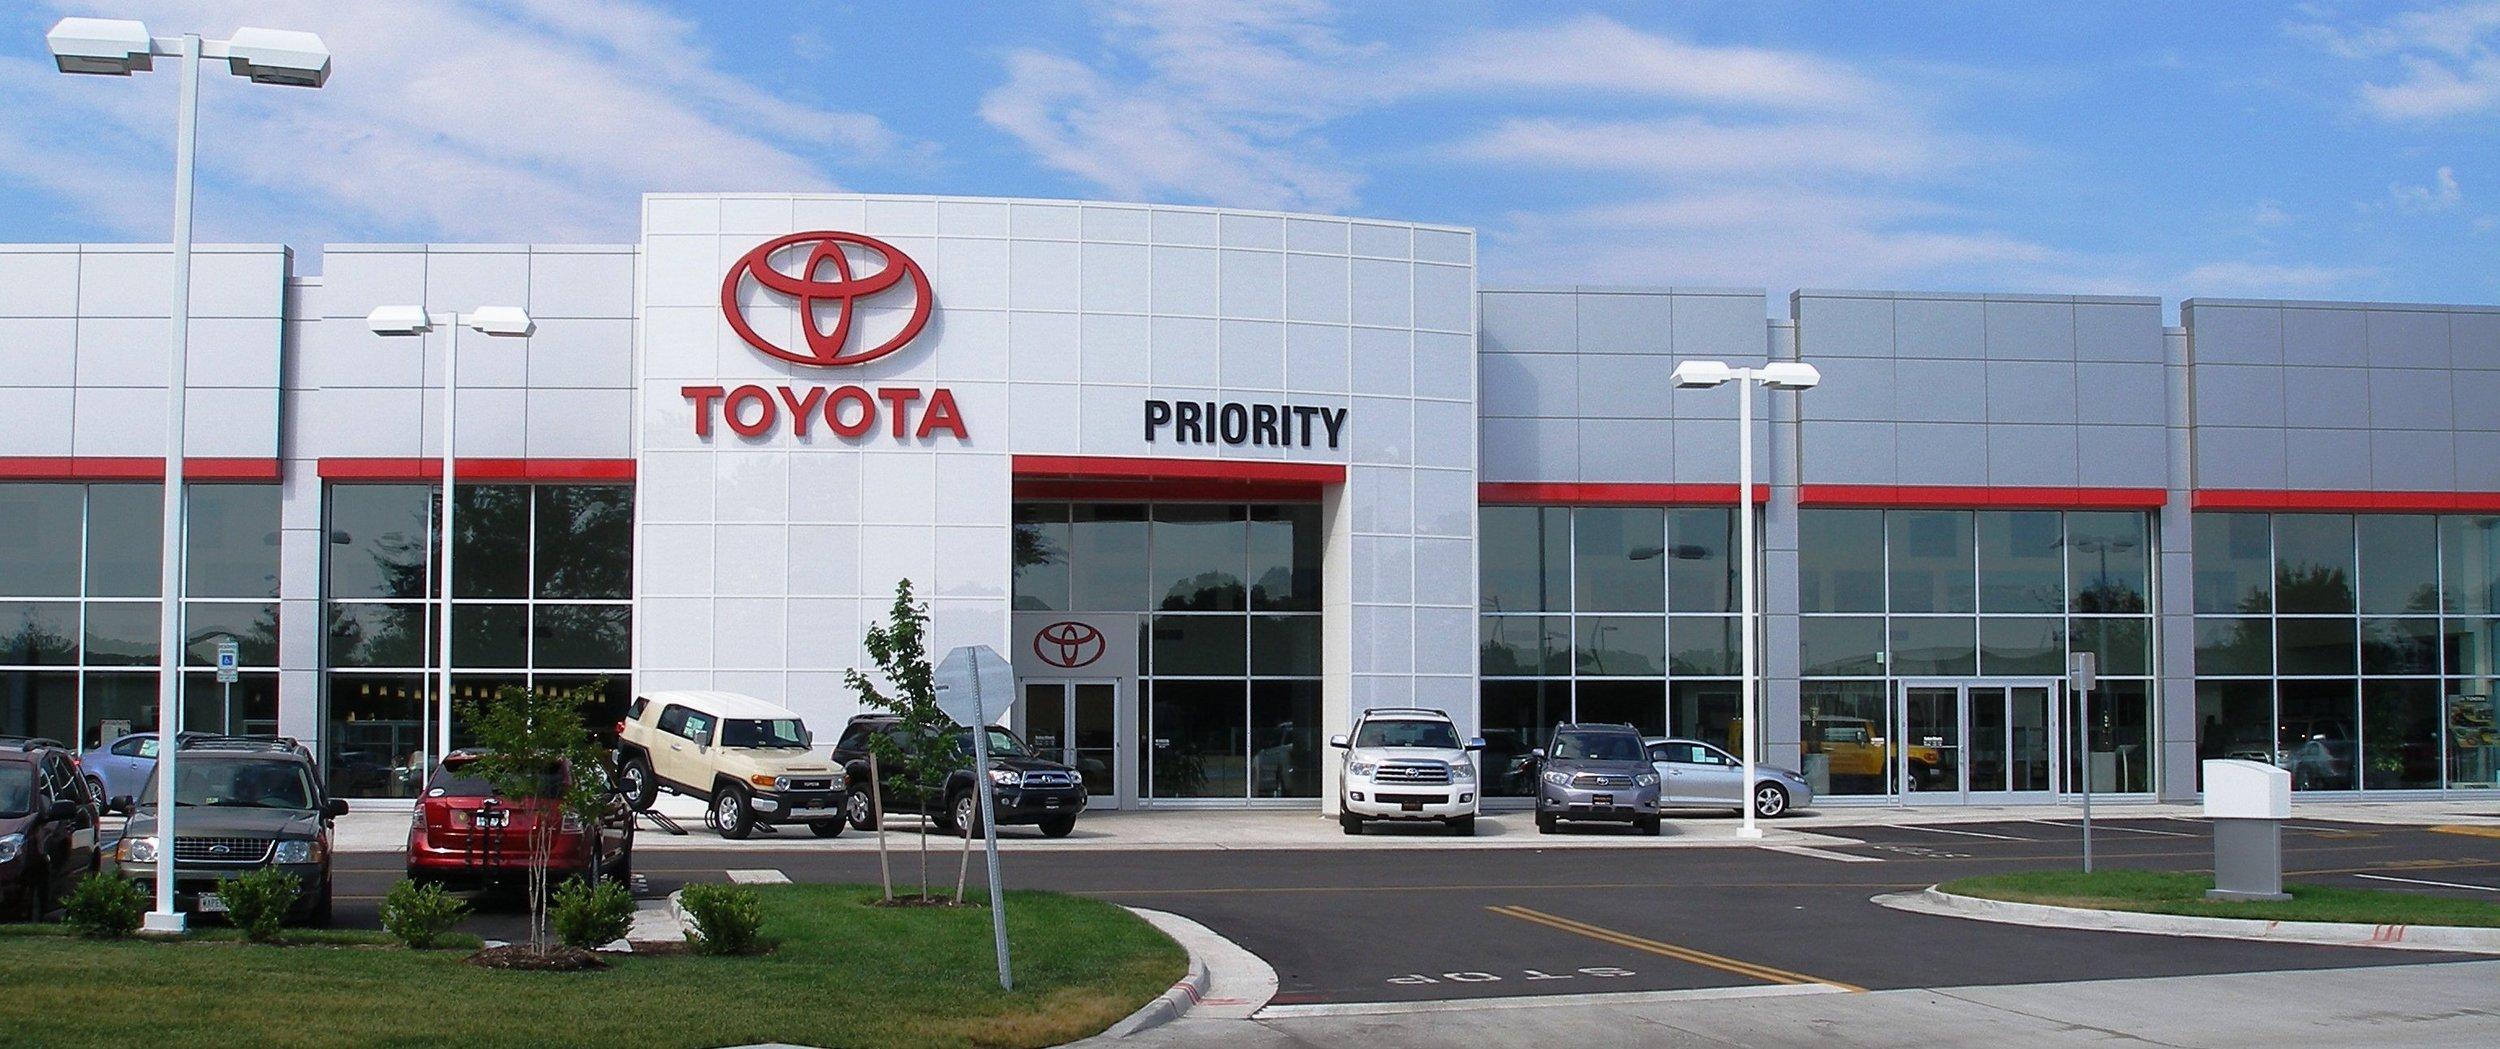 Priority Toyota #auto#car#priorityautomotive#automobile#autodealership#cafe#mechanic#commercial#architect#architecture#toyota#Chesapeake